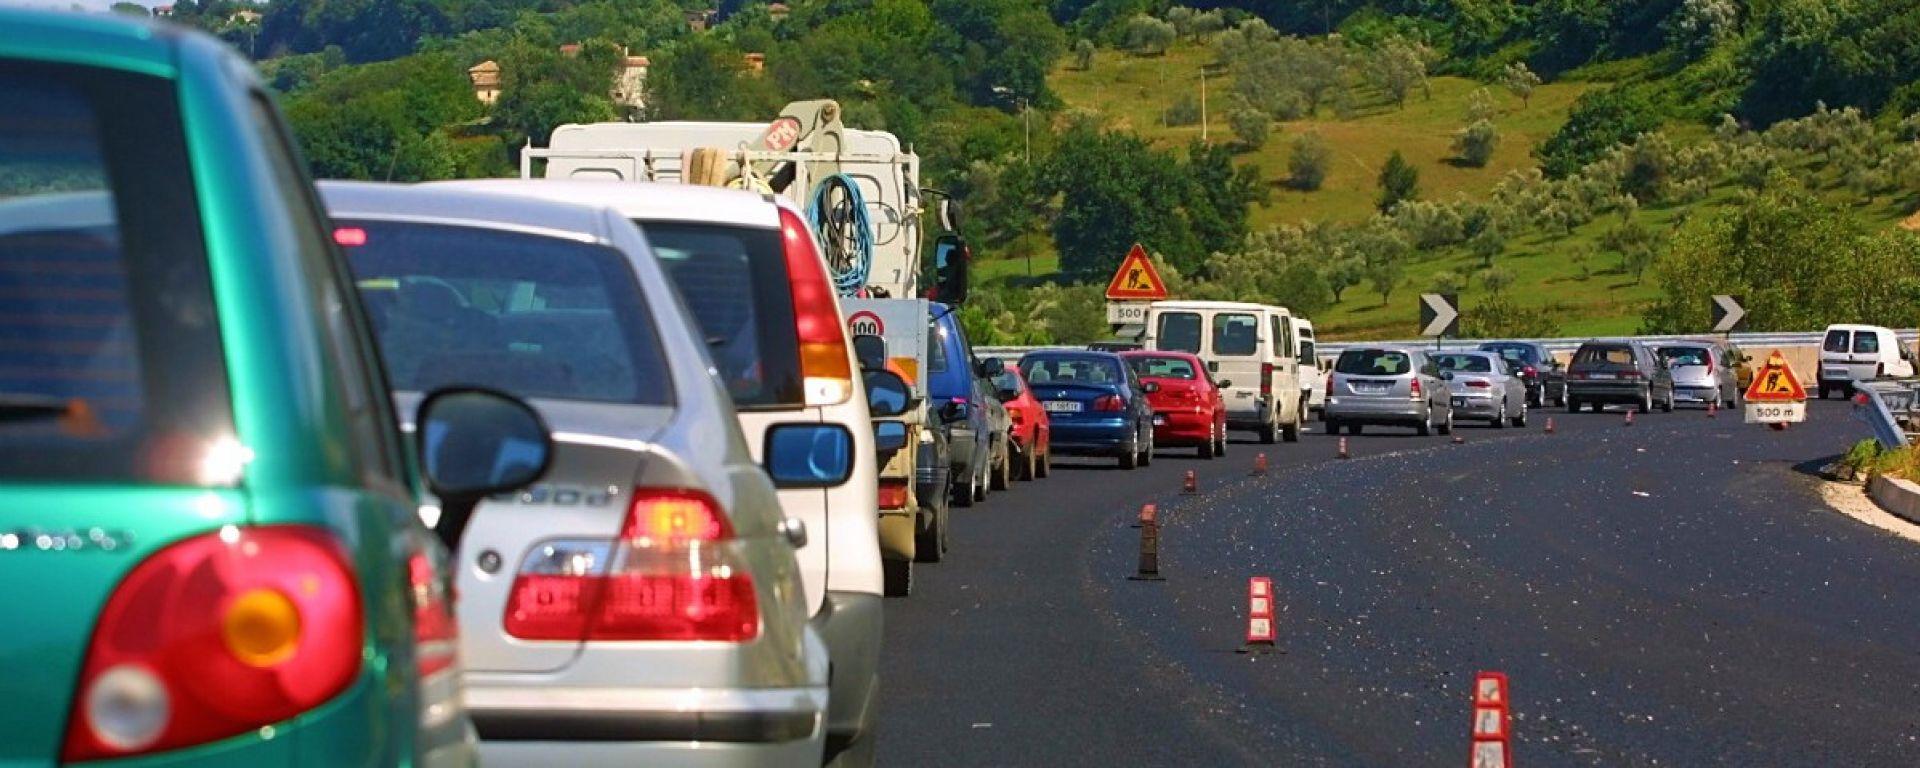 Altroconsumo avvia una class action contro Autostrade